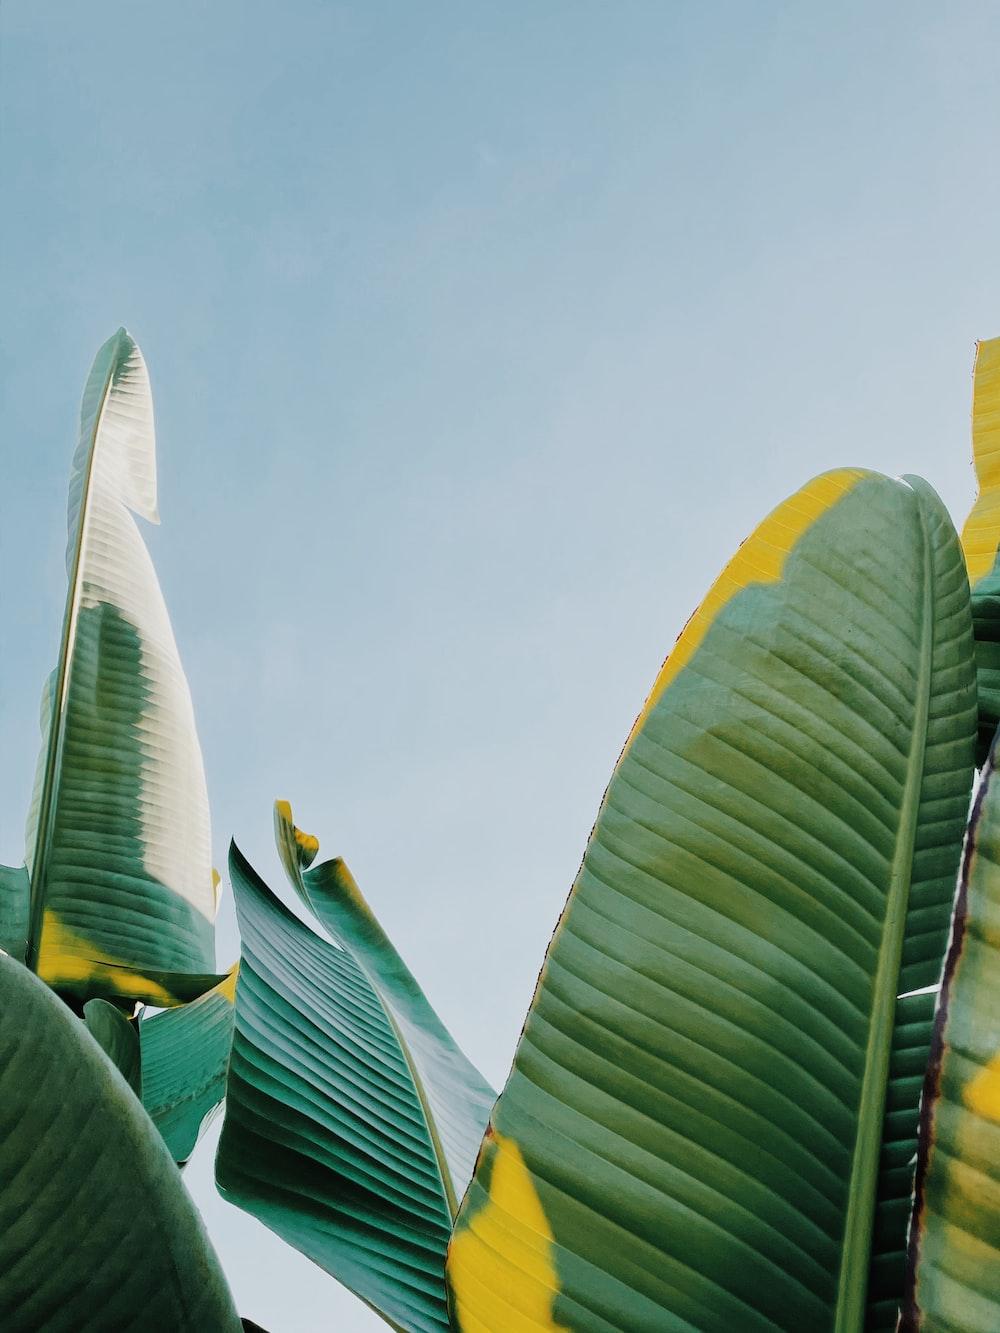 green banana leaves under blue sky during daytime